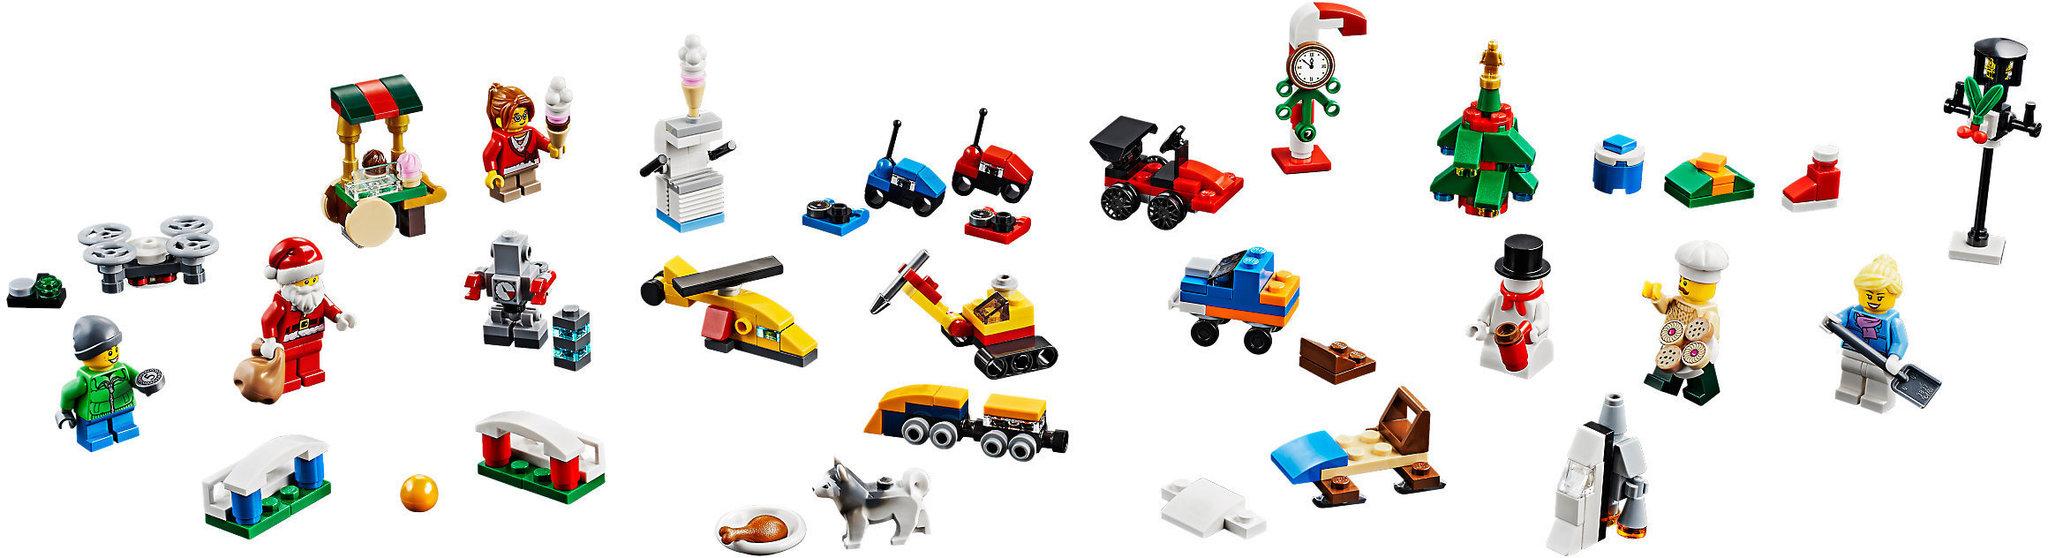 Calendrier Lego City.Lego City 60201 Le Calendrier De L Avent Lego City